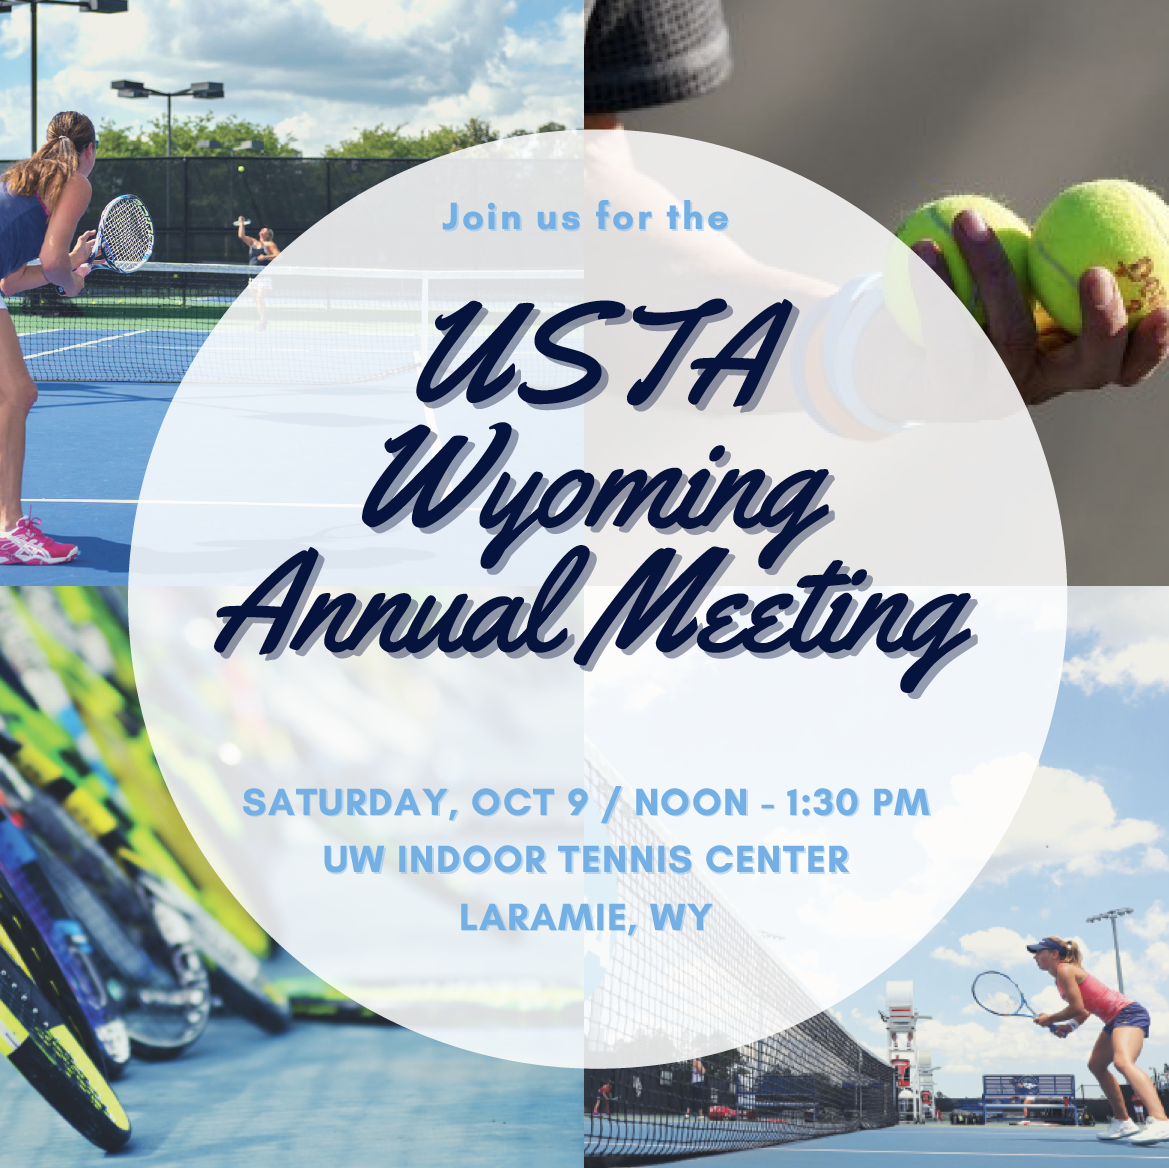 USTA_Annual_Meeting_2021